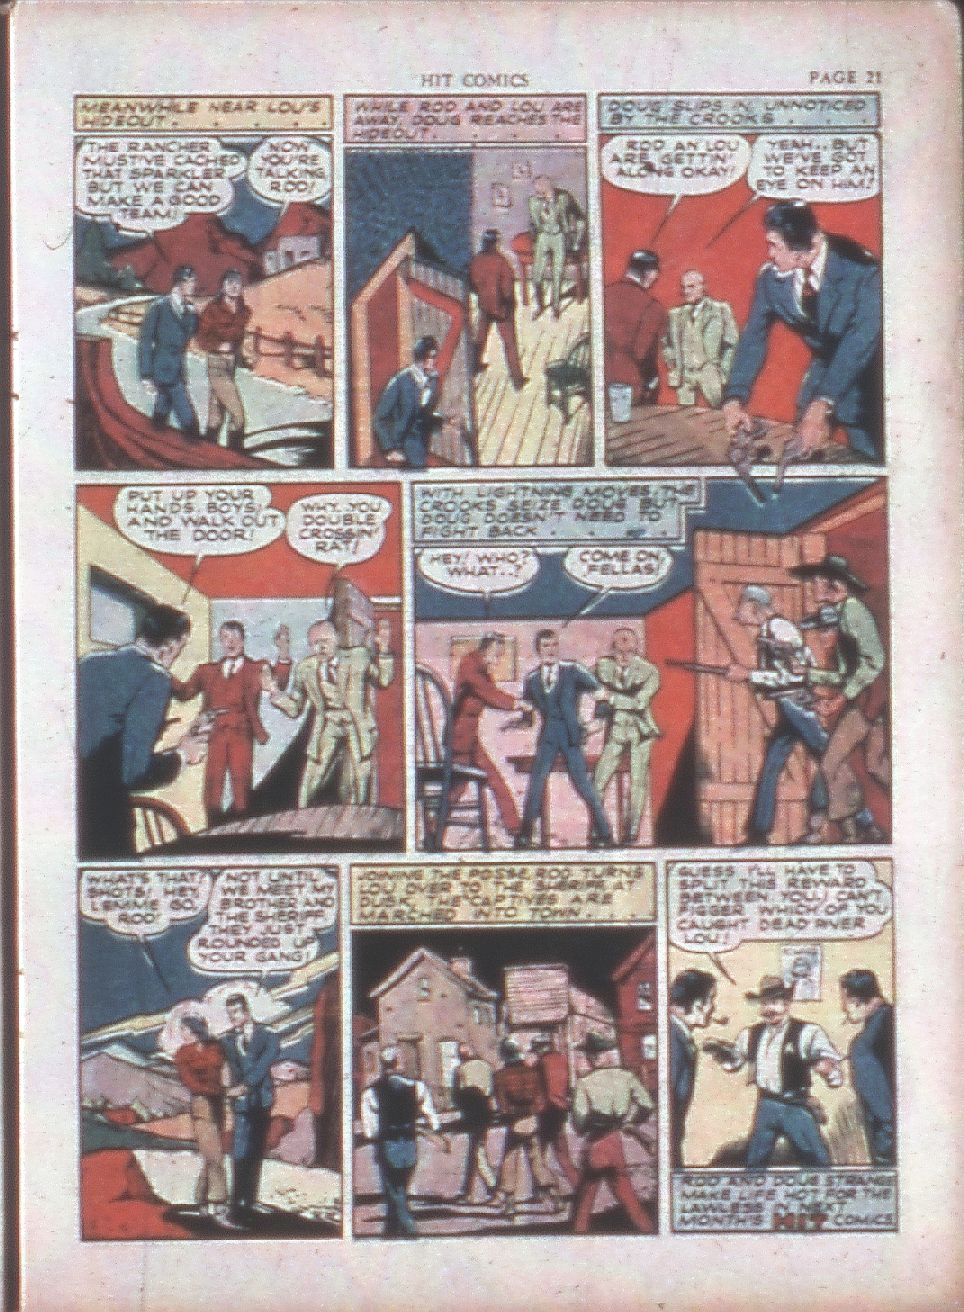 Read online Hit Comics comic -  Issue #15 - 23